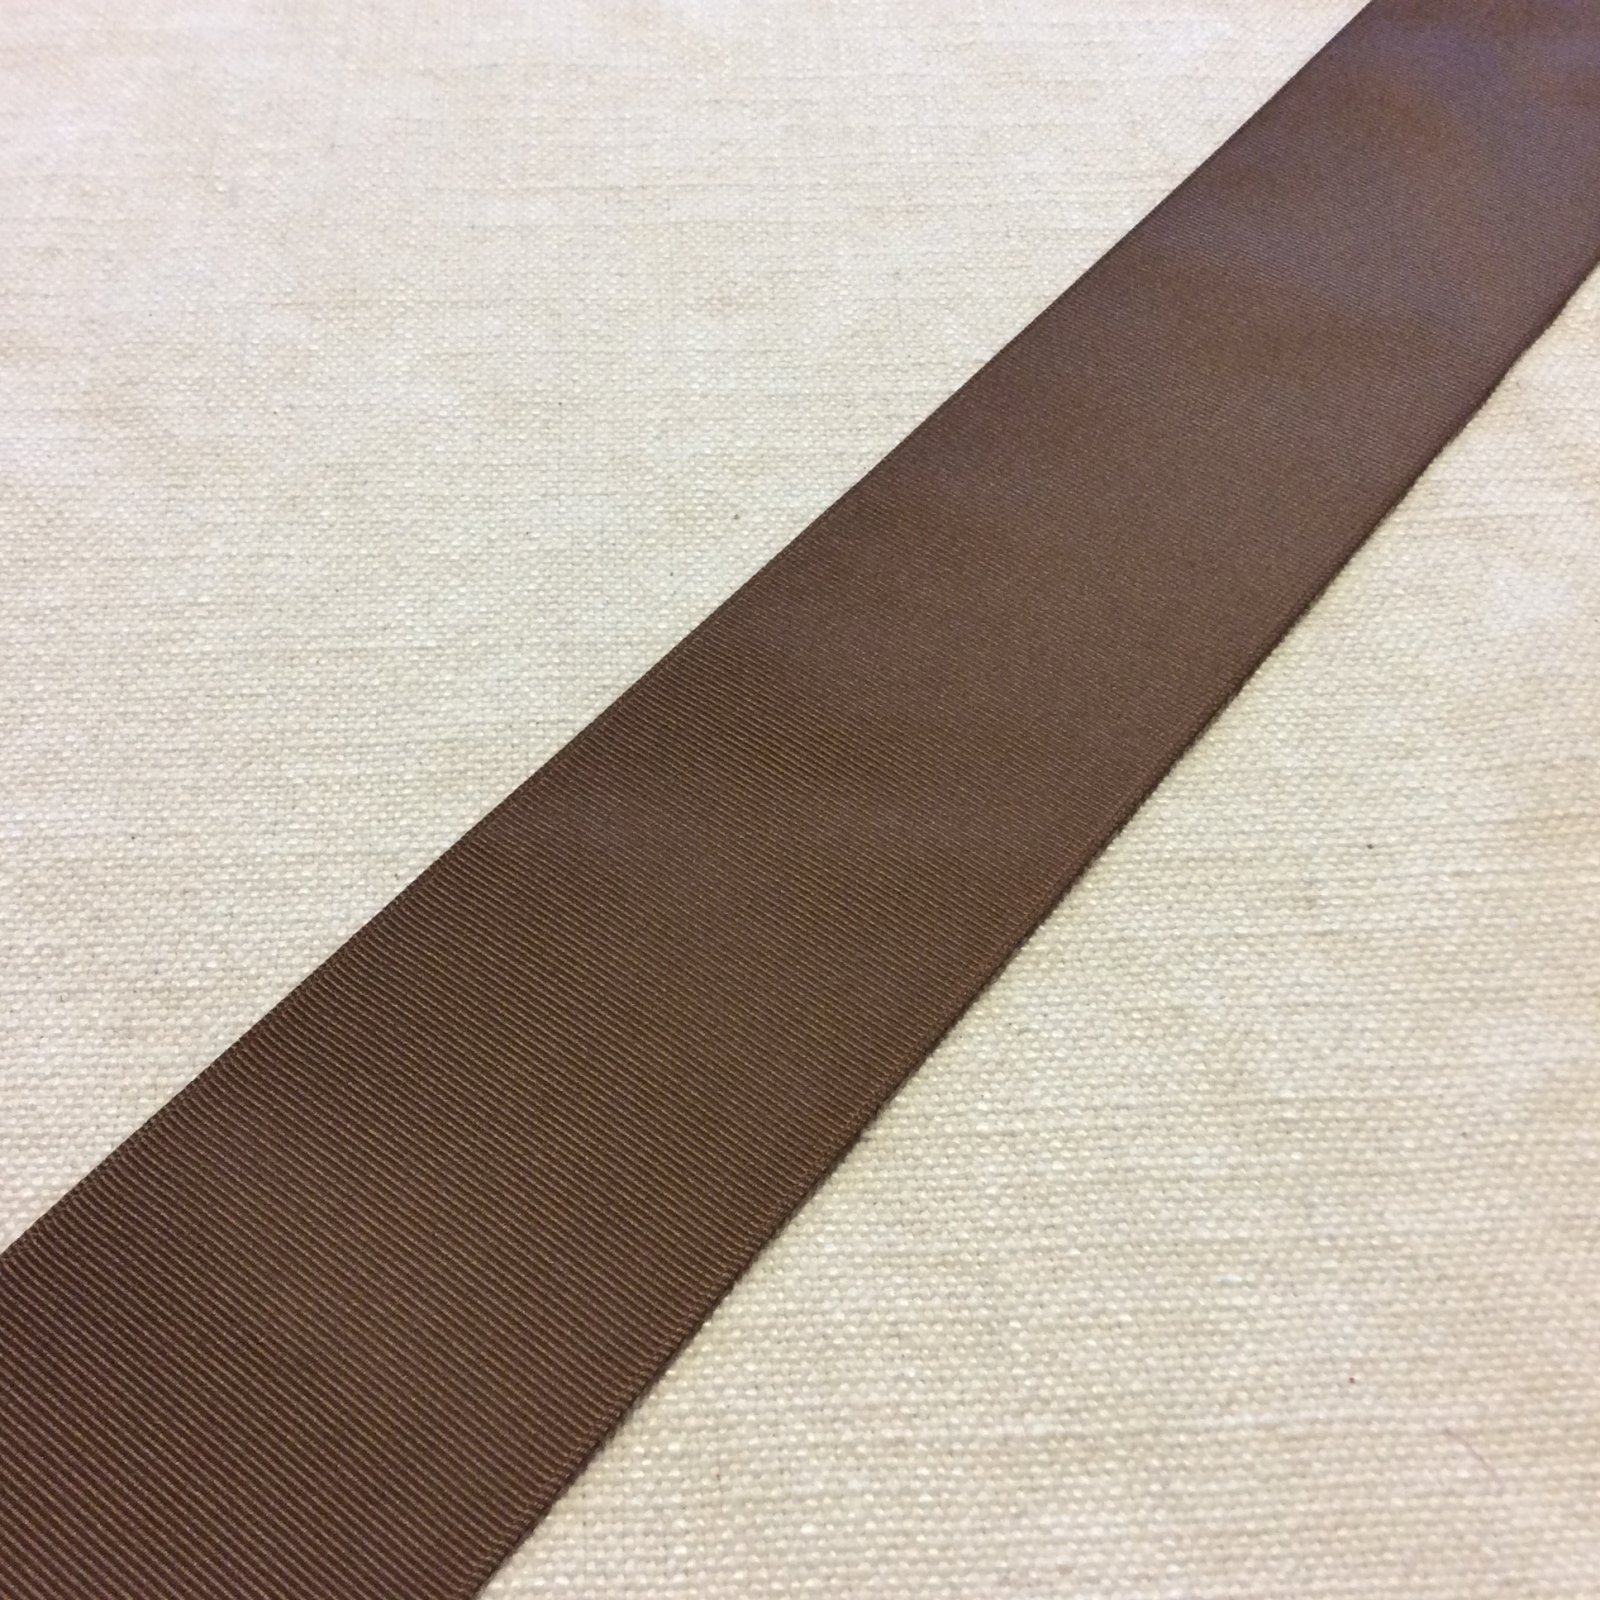 Grosgrain Ribbon 2.5 Brown Trim Ribbon RIB1137